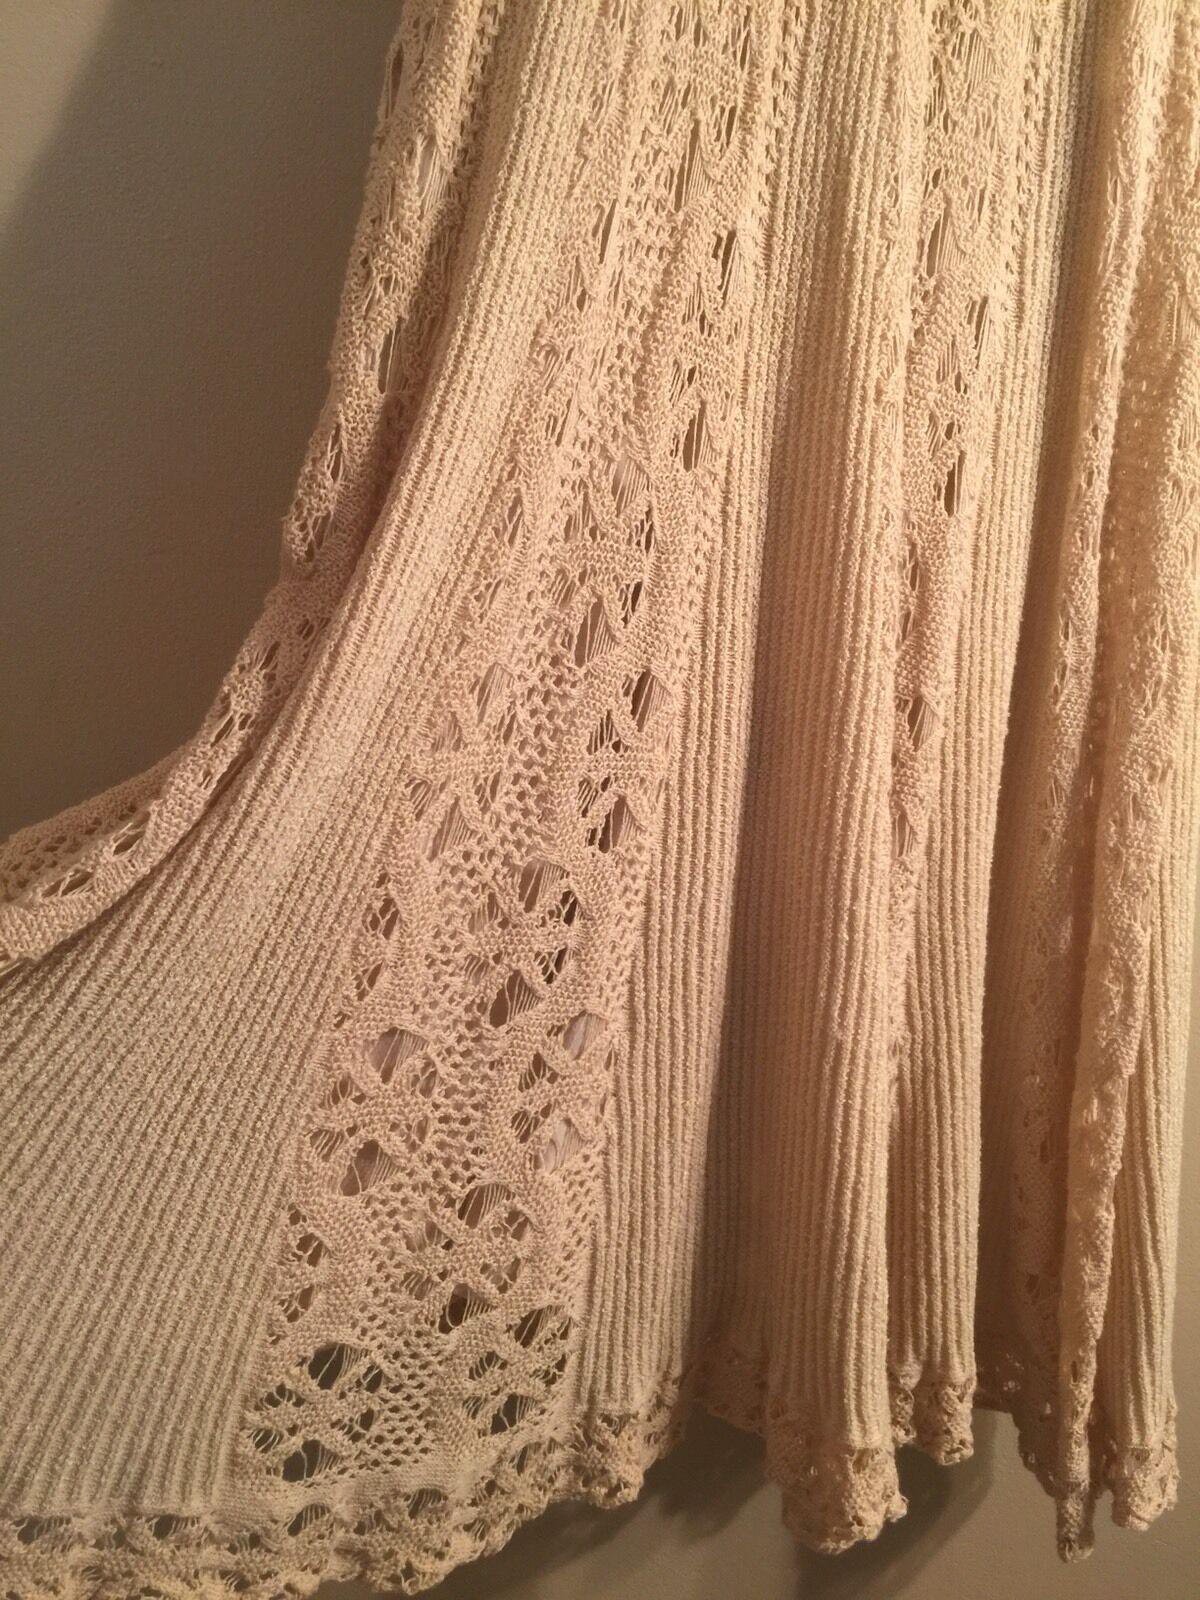 NEW Women's MOTH Anthropologie Beige Knit Knit Knit CROCHETED CLOUDS Sweater DRESS XS RARE 351159